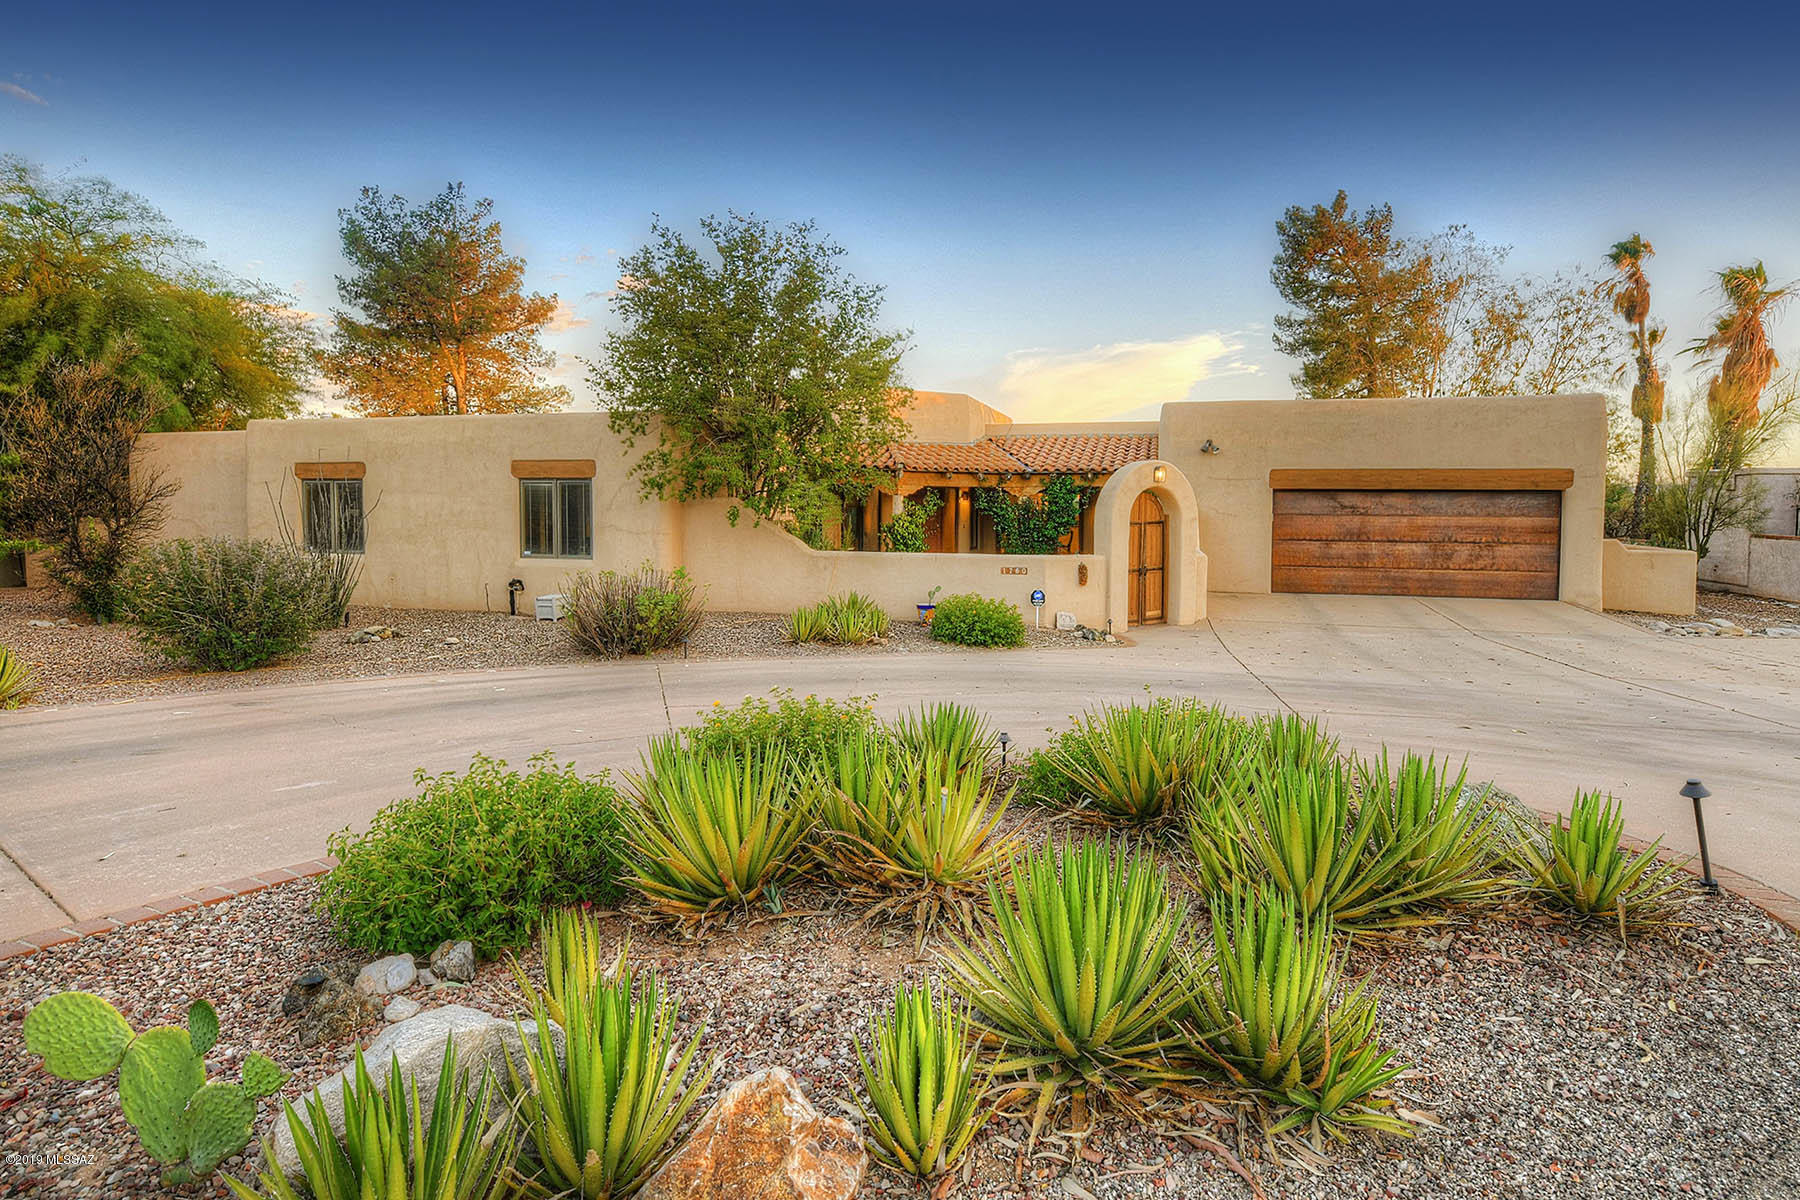 Photo of 1760 E Rio De La Loma, Tucson, AZ 85718